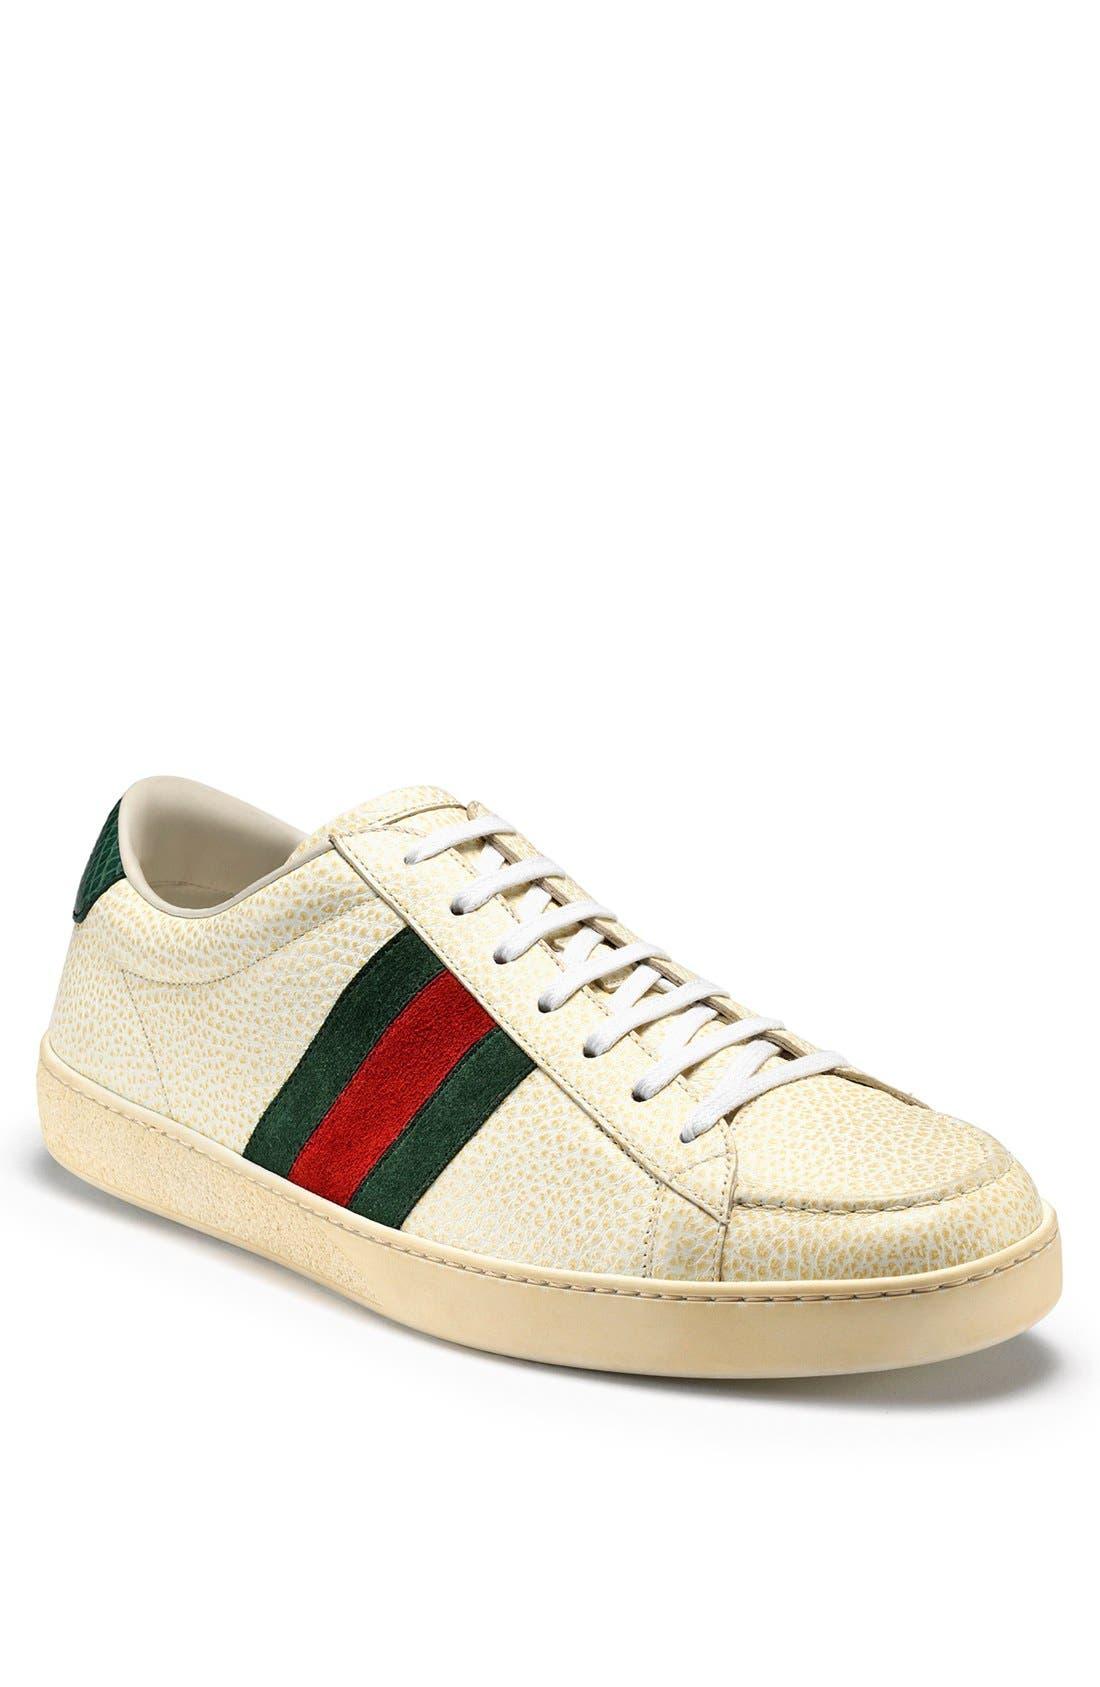 Alternate Image 1 Selected - Gucci 'Orizon' Sneaker